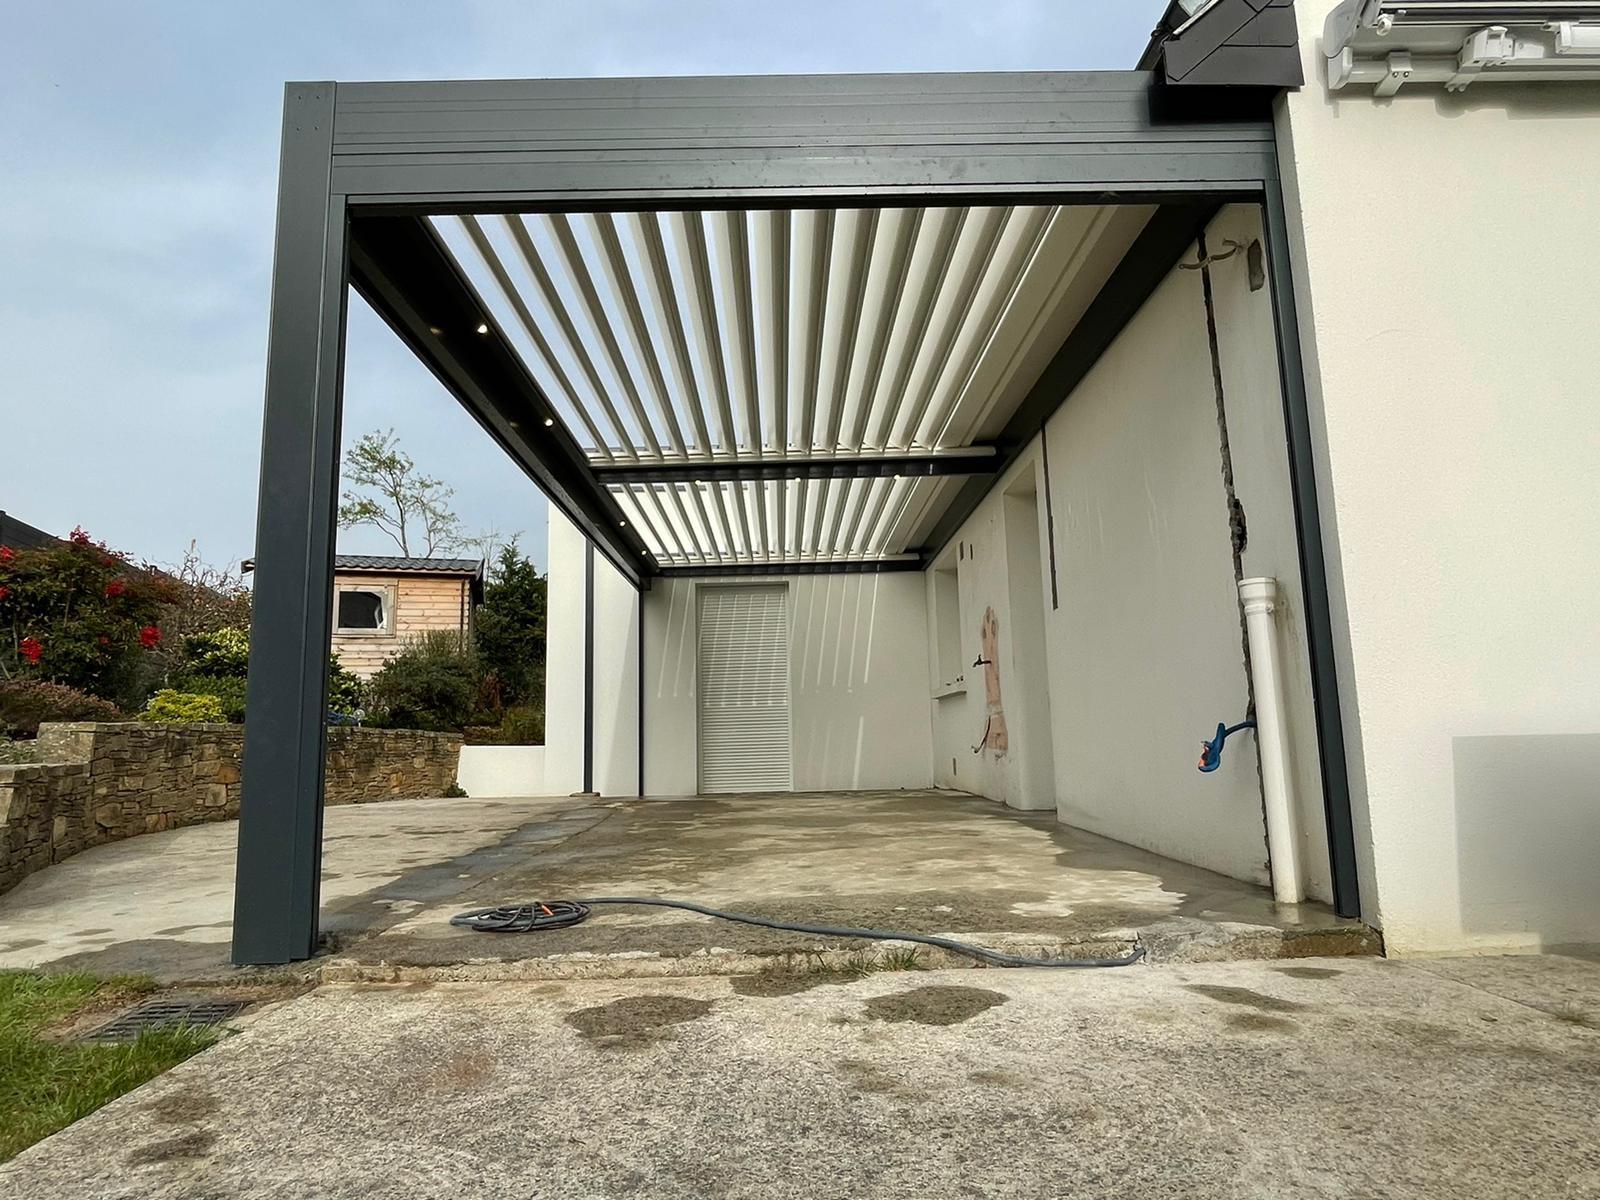 Pergola Bioclimatique aluminium Solisysteme Treillieres - Orvault - Nantes